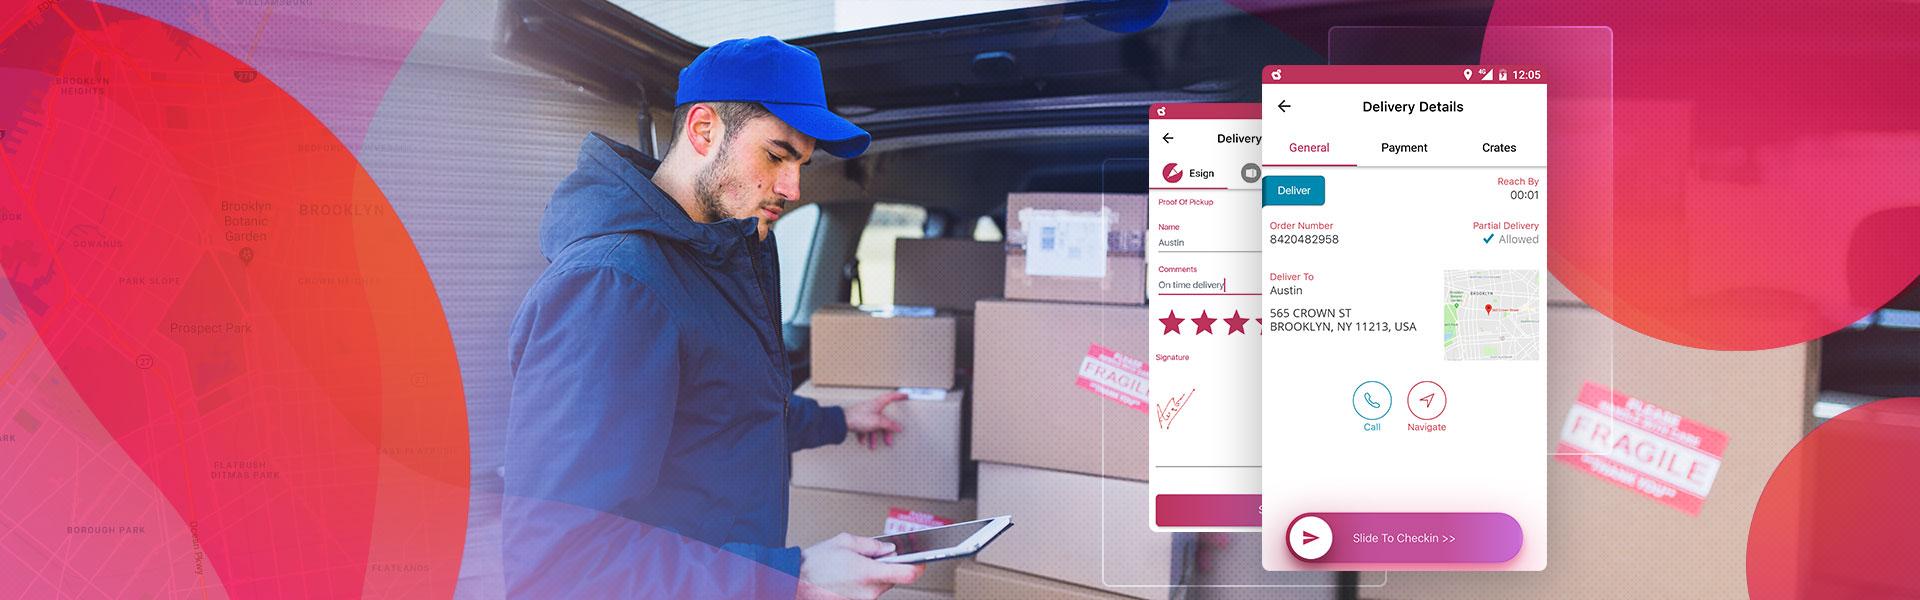 Feature Snapshot! App-Driven Last Mile Delivery Optimization